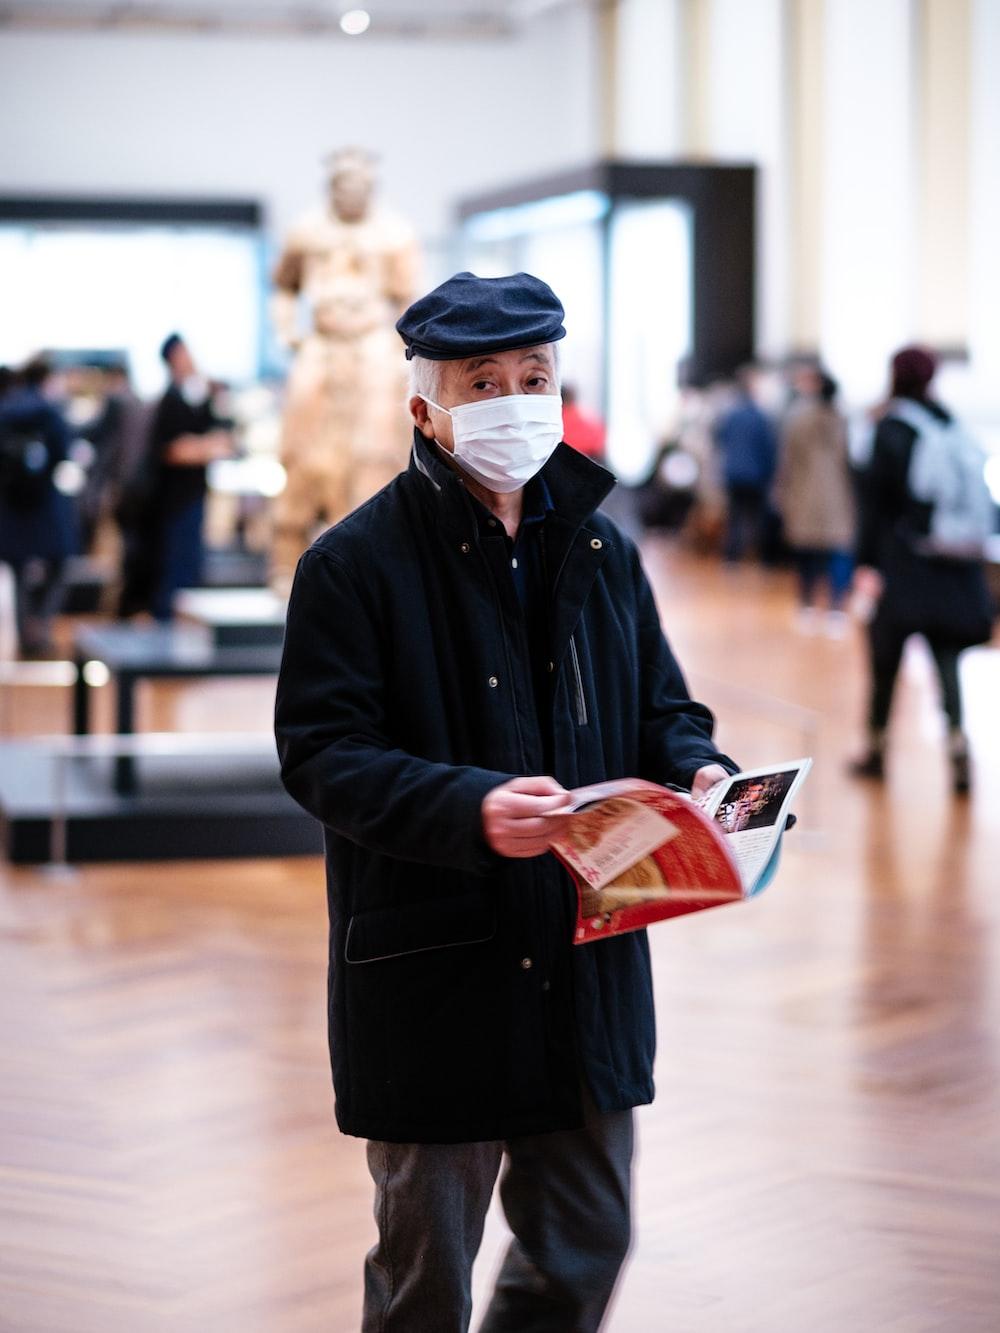 man in black coat holding book